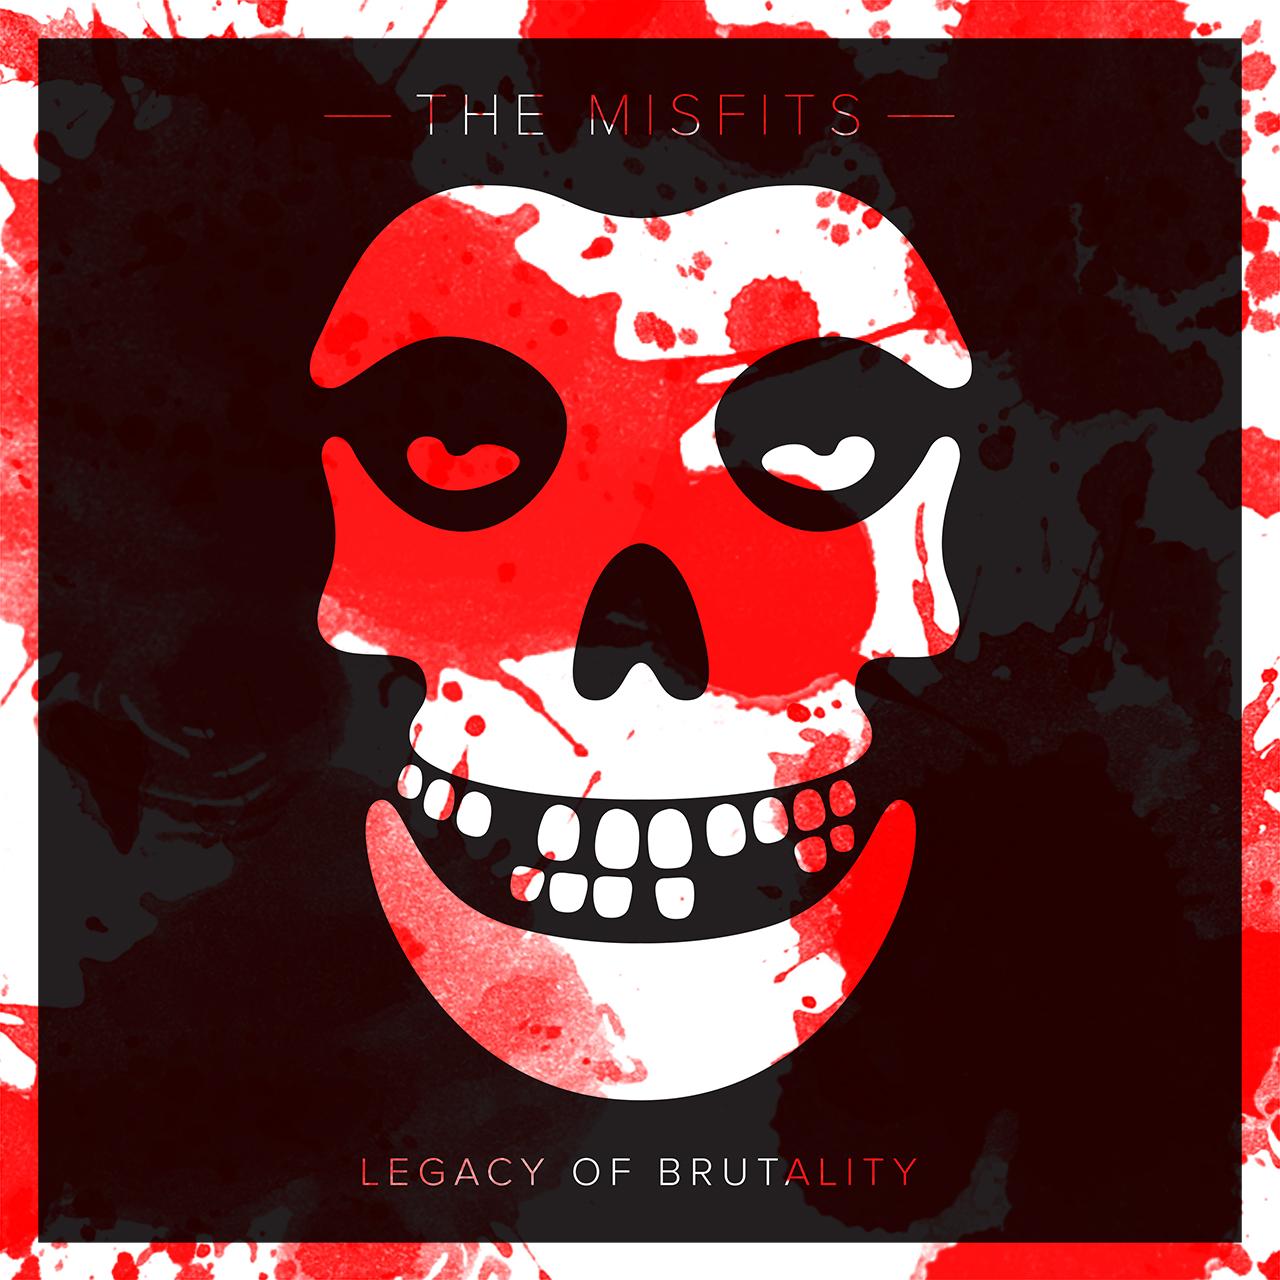 Misfits_LegacyBrutality_1280x1280